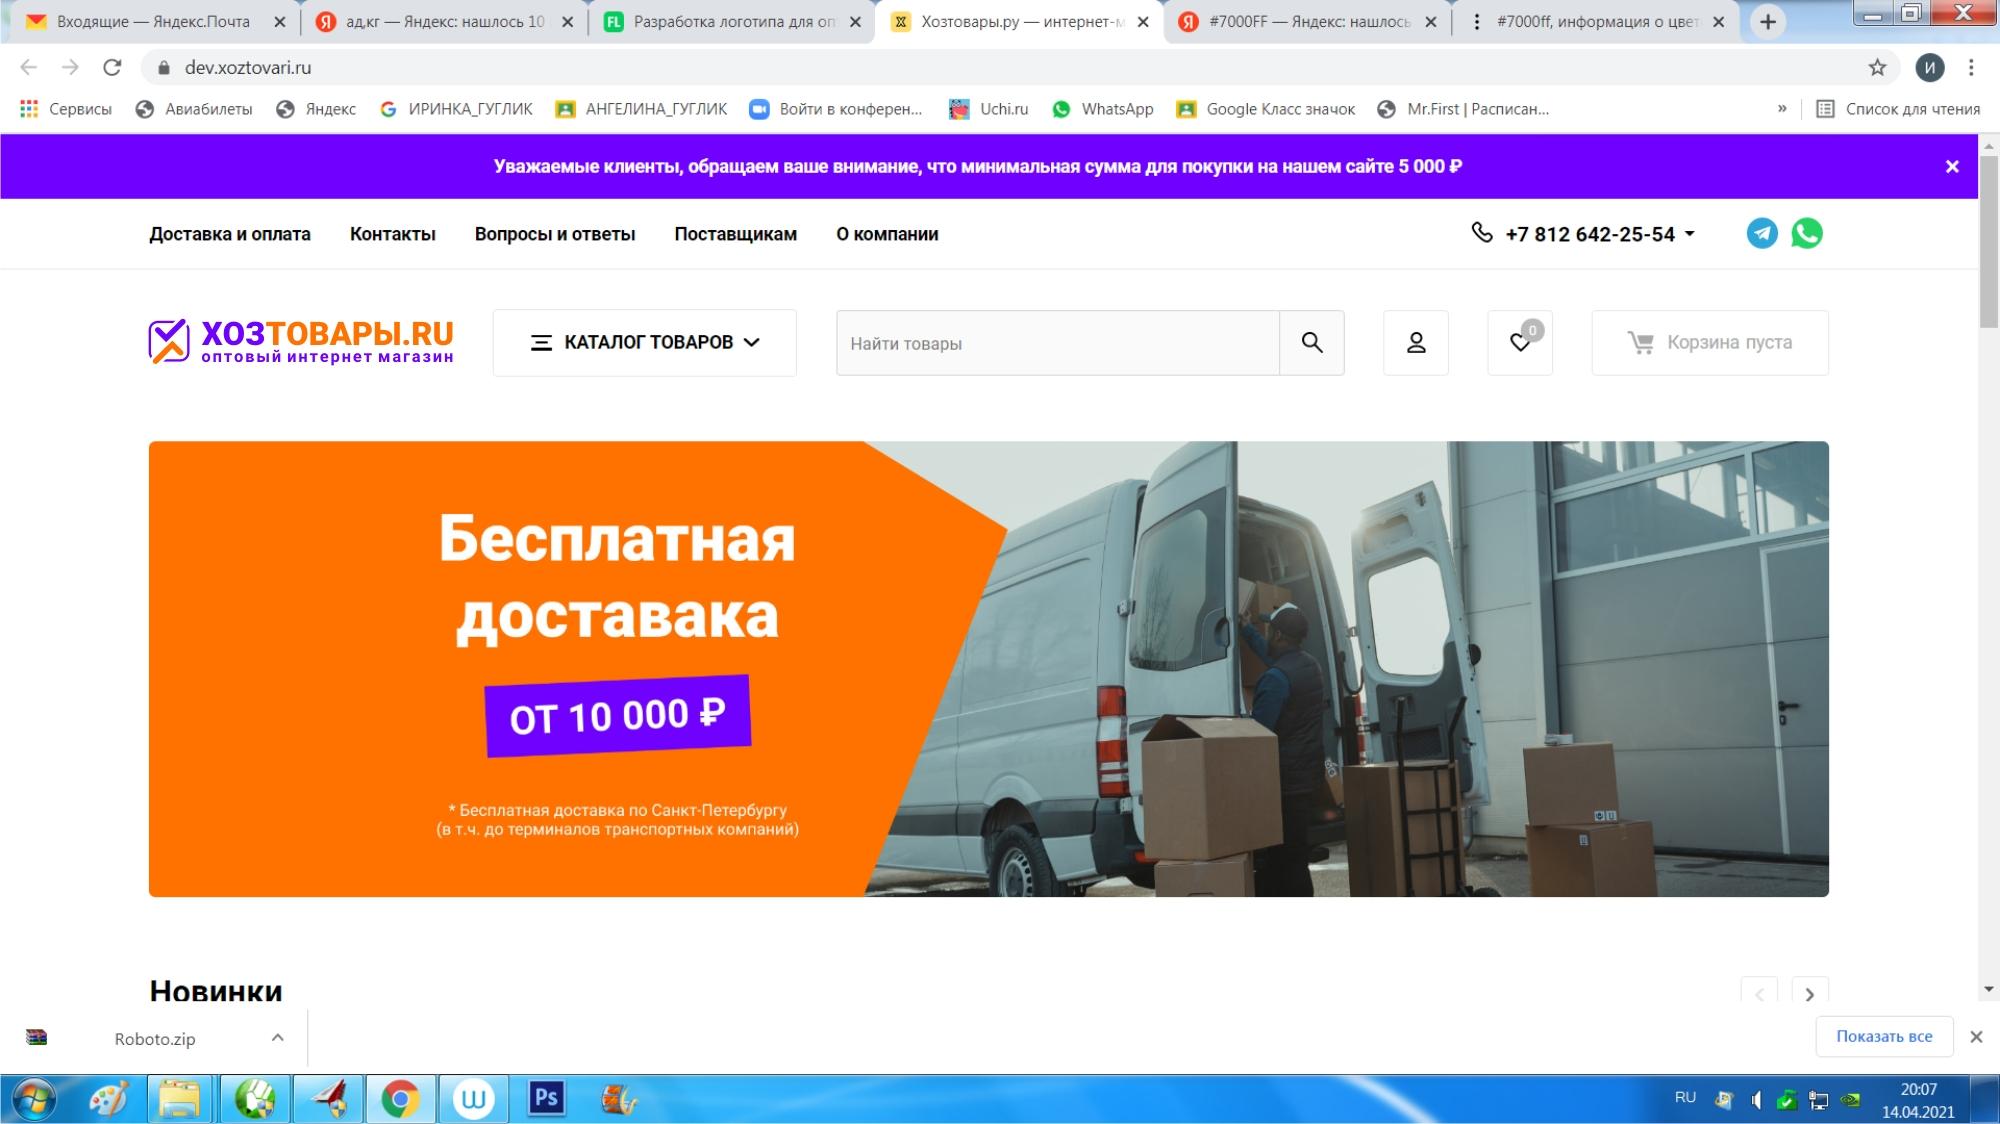 Разработка логотипа для оптового интернет-магазина «Хозтовары.ру» фото f_51960770647819fd.jpg